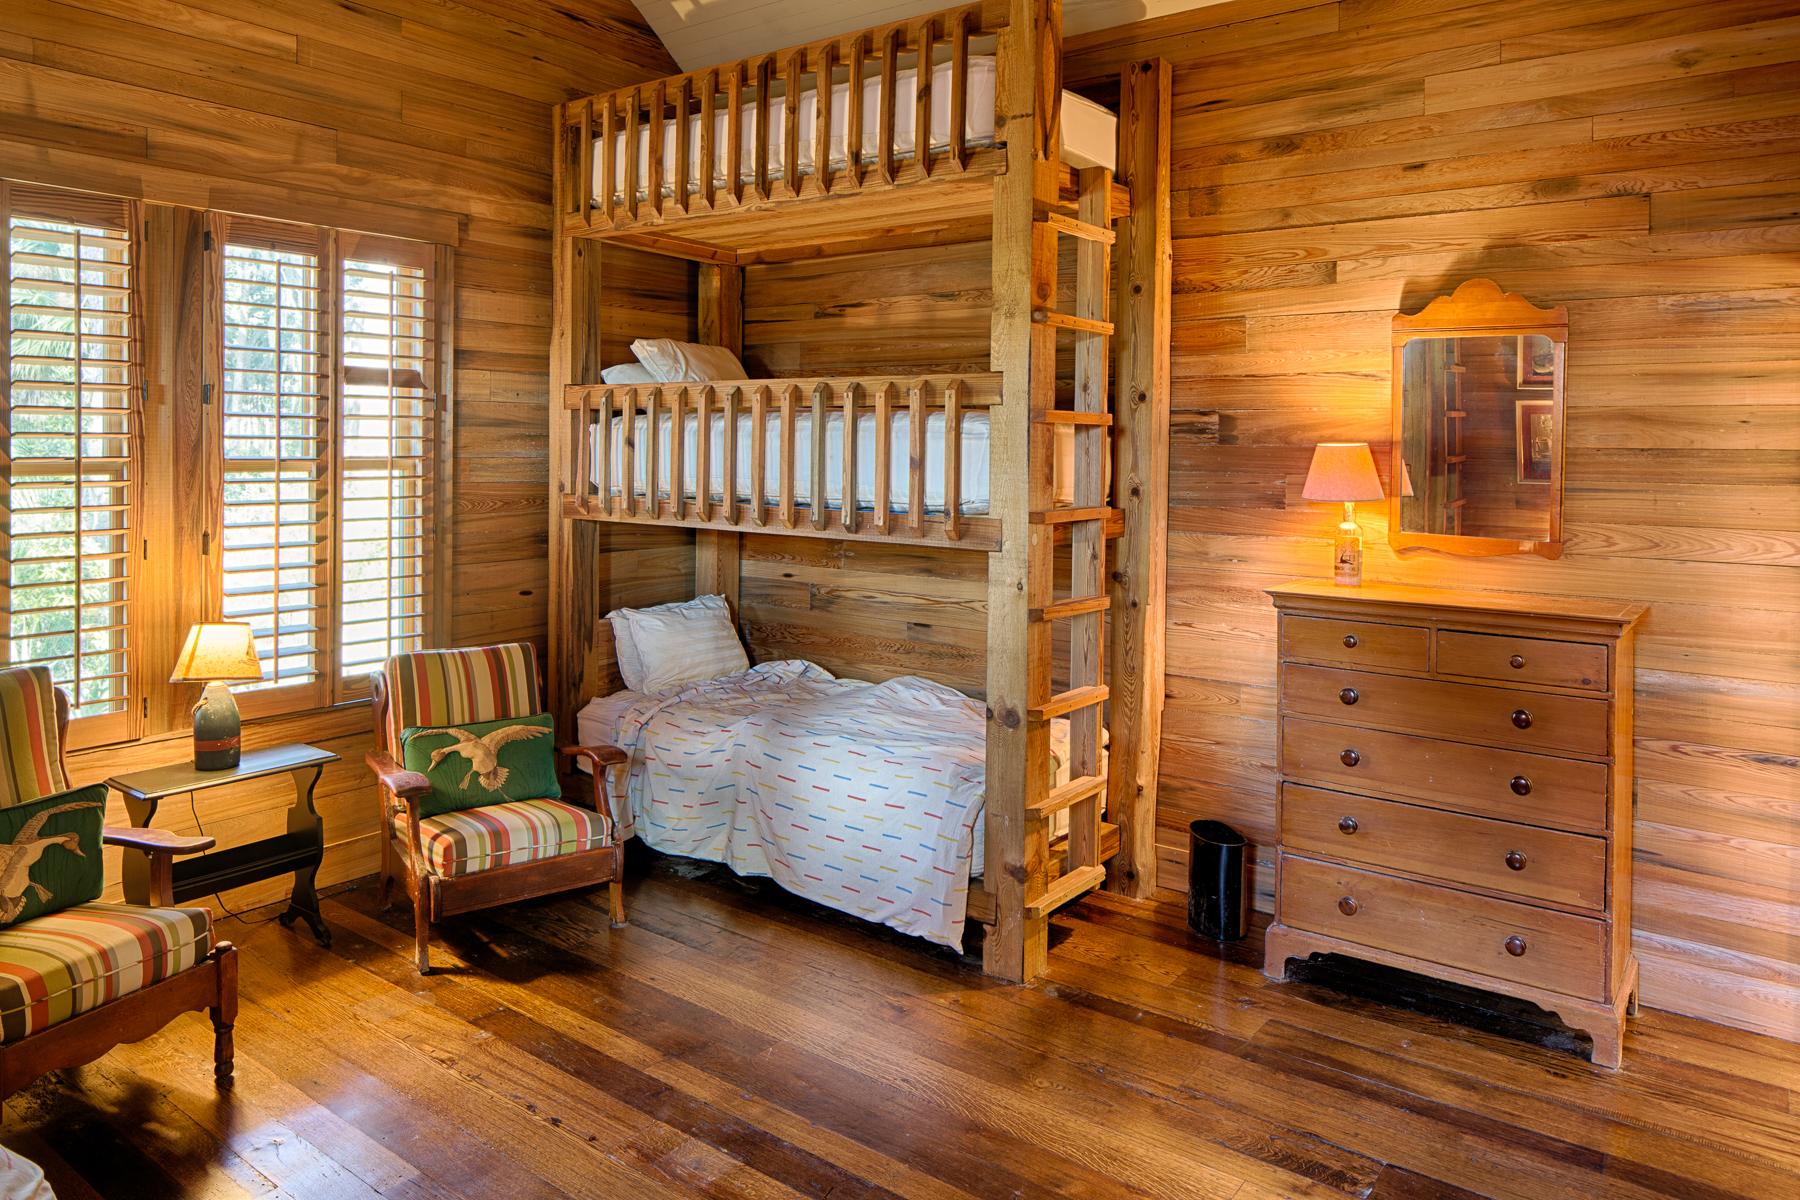 Additional photo for property listing at 945 Mount Pelia Road 945 Mt. Pelia Bluffton, South Carolina 29910 United States